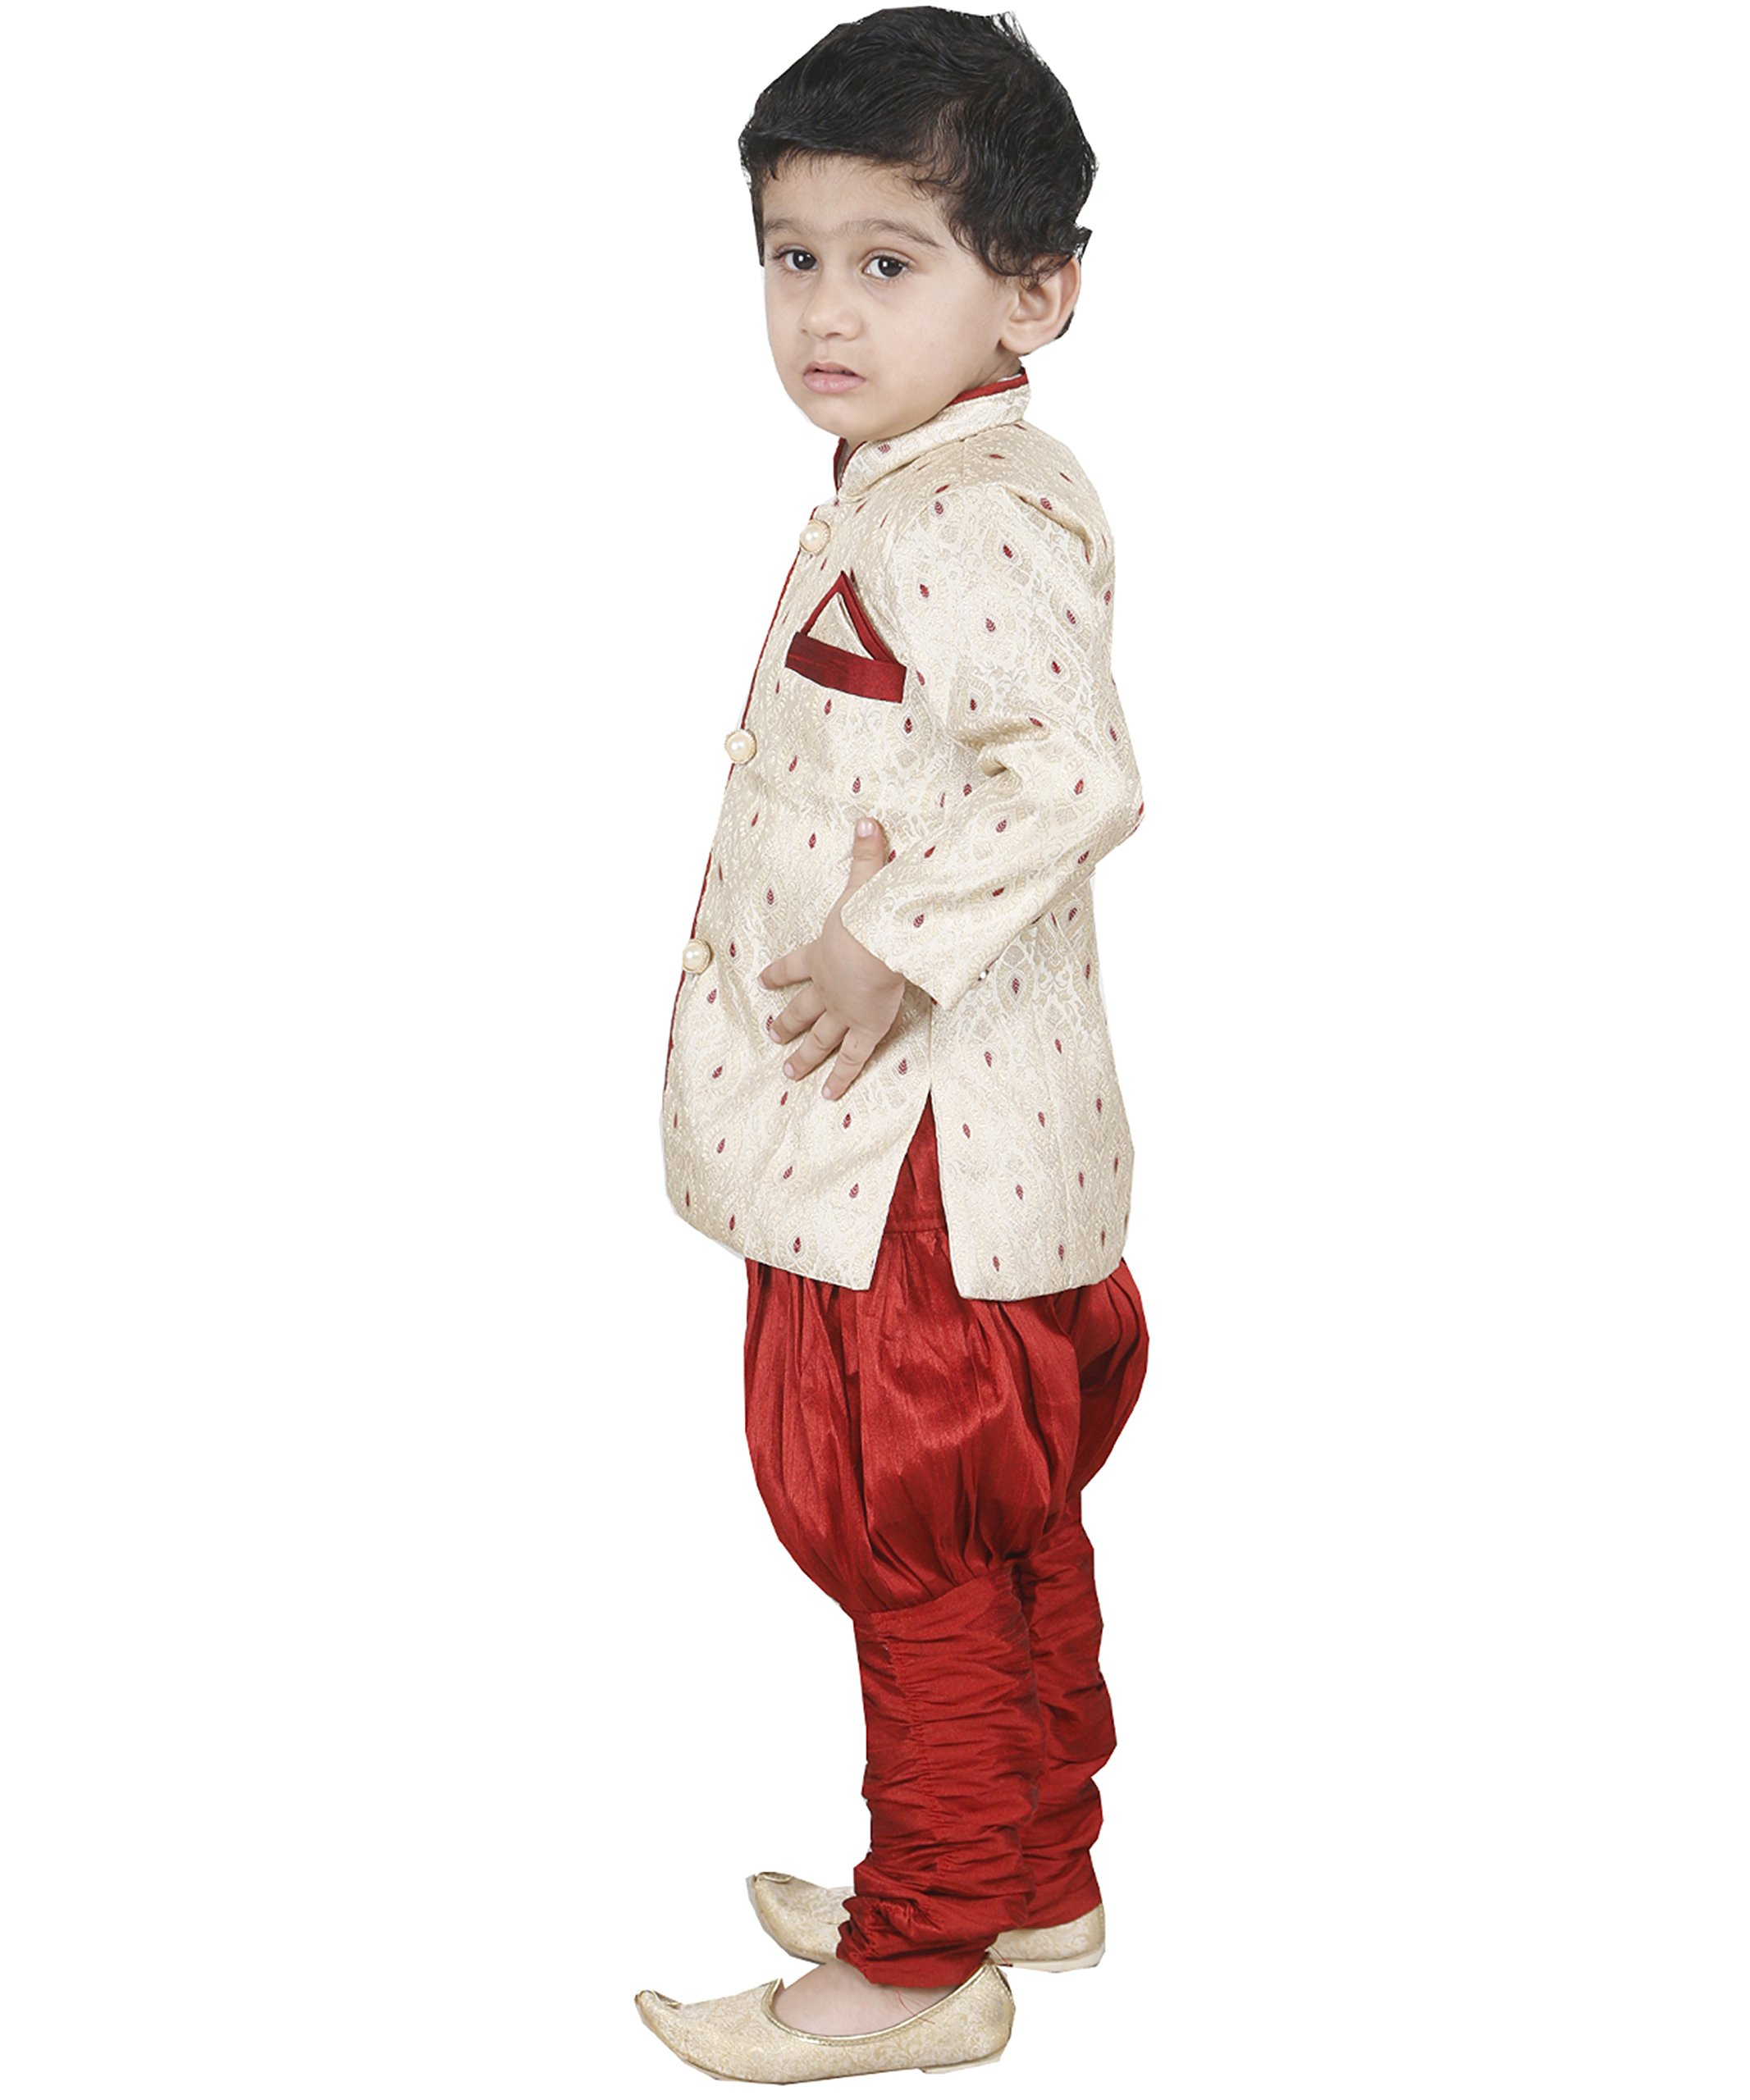 JBN Creation Boys Beige Banarasi Cotton Silk Kurta Pyjama With Jodhpuri Breeches (Size: 6-12 Months) by jbn creation (Image #2)